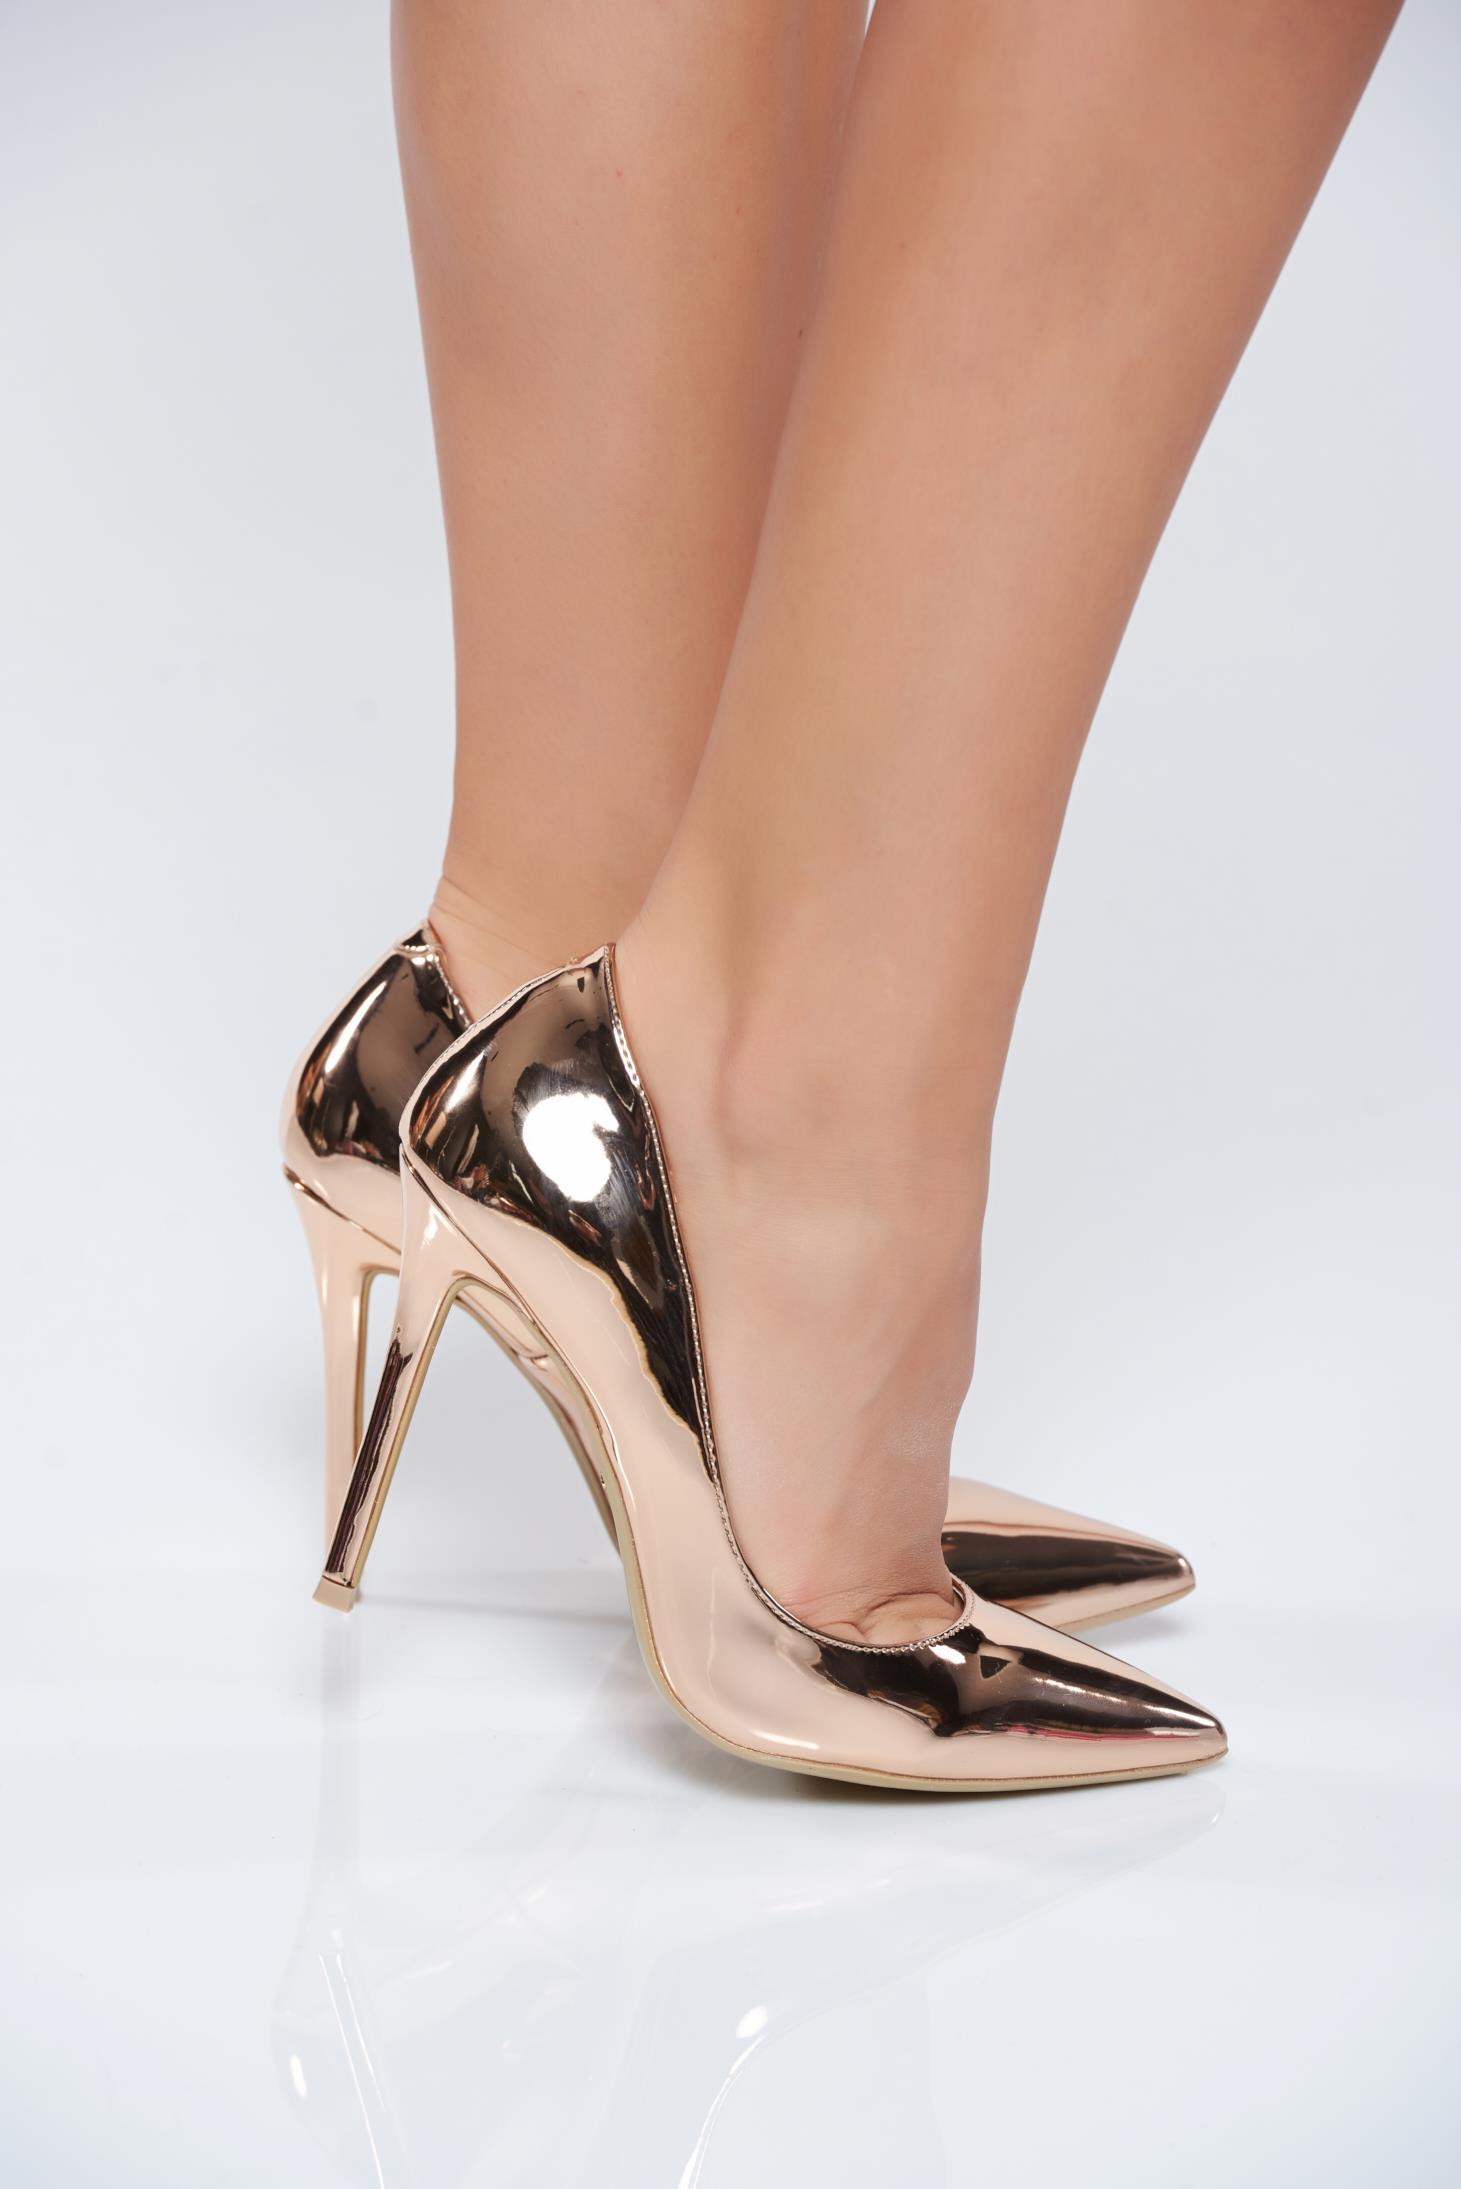 3ca4c50a7d0 elegant-high-heels-rosa-stiletto-shoes-metallic-as-S030702-3-297380.jpg